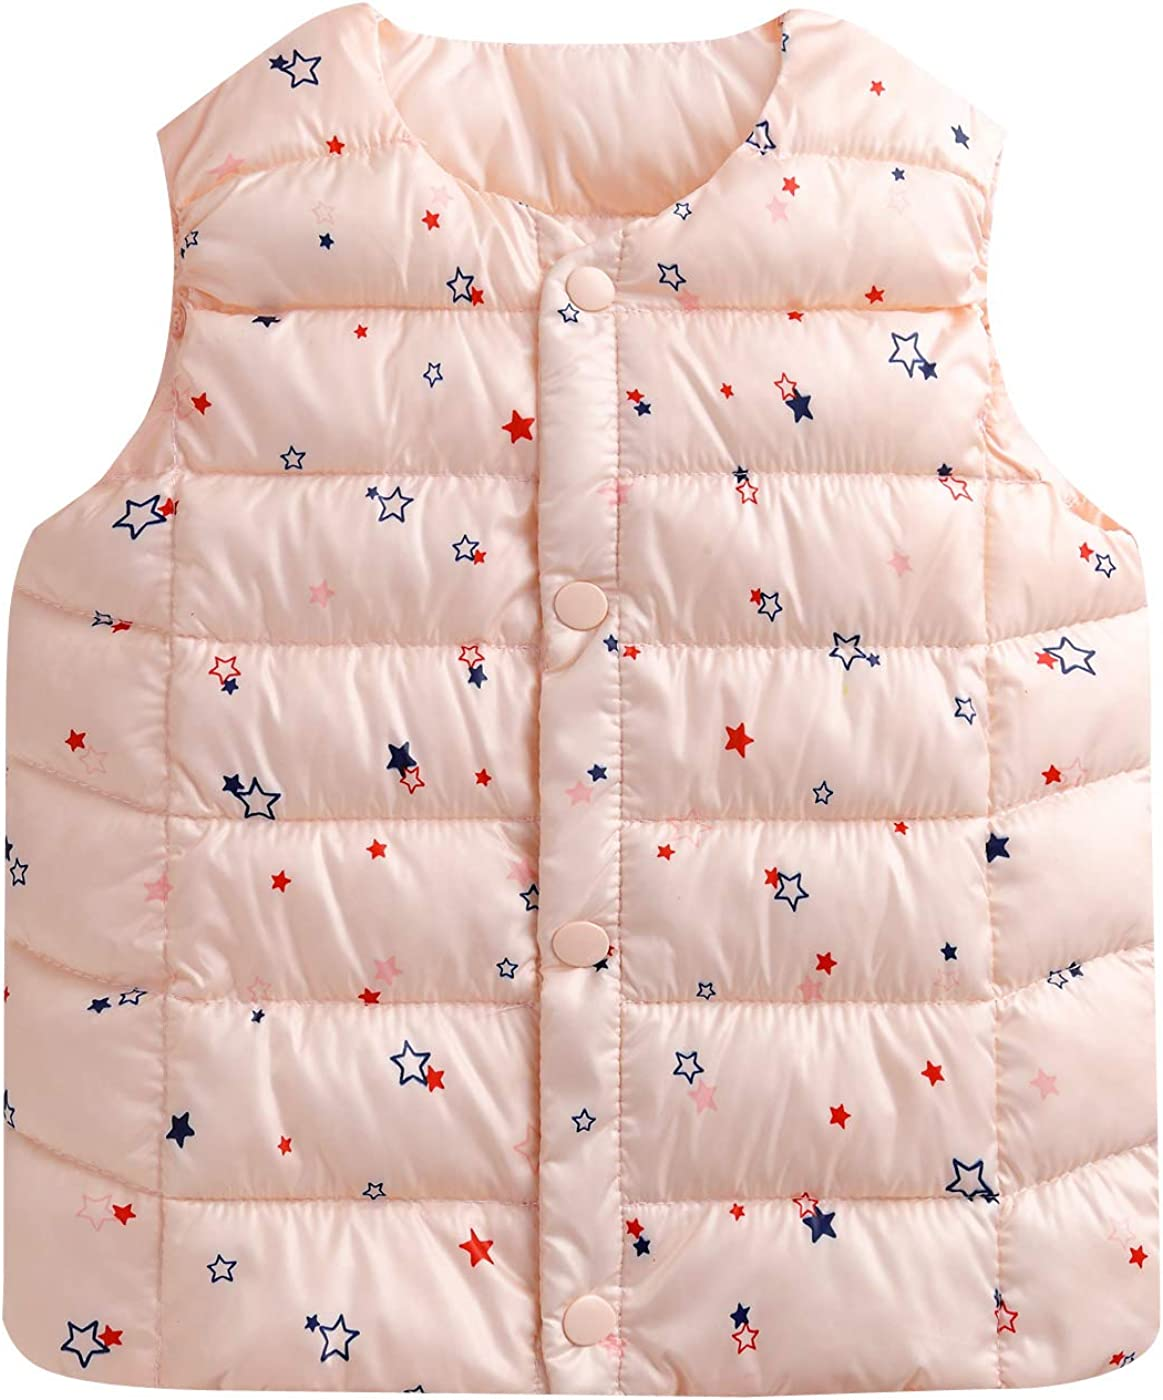 Happy Cherry Boys Quilted Packable Hoodie Lightweight Puffer Jacket Windproof Outwear Children Warm Duck Down Coat Pink